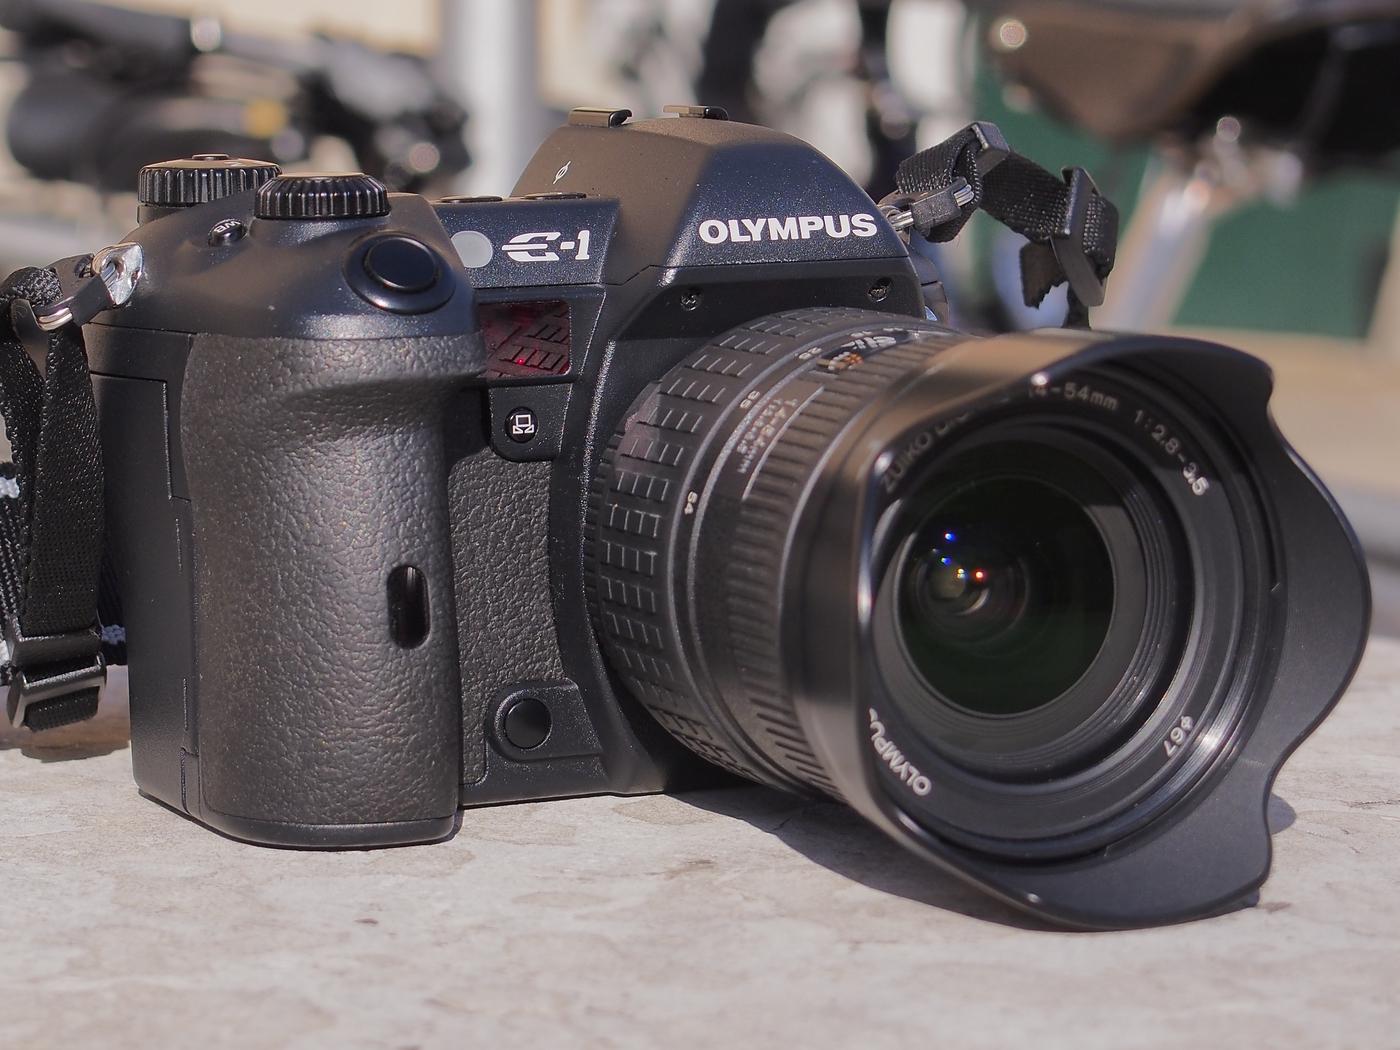 Olympus E-1 with the Zuiko Digital 14-54 f/2.8-3.5